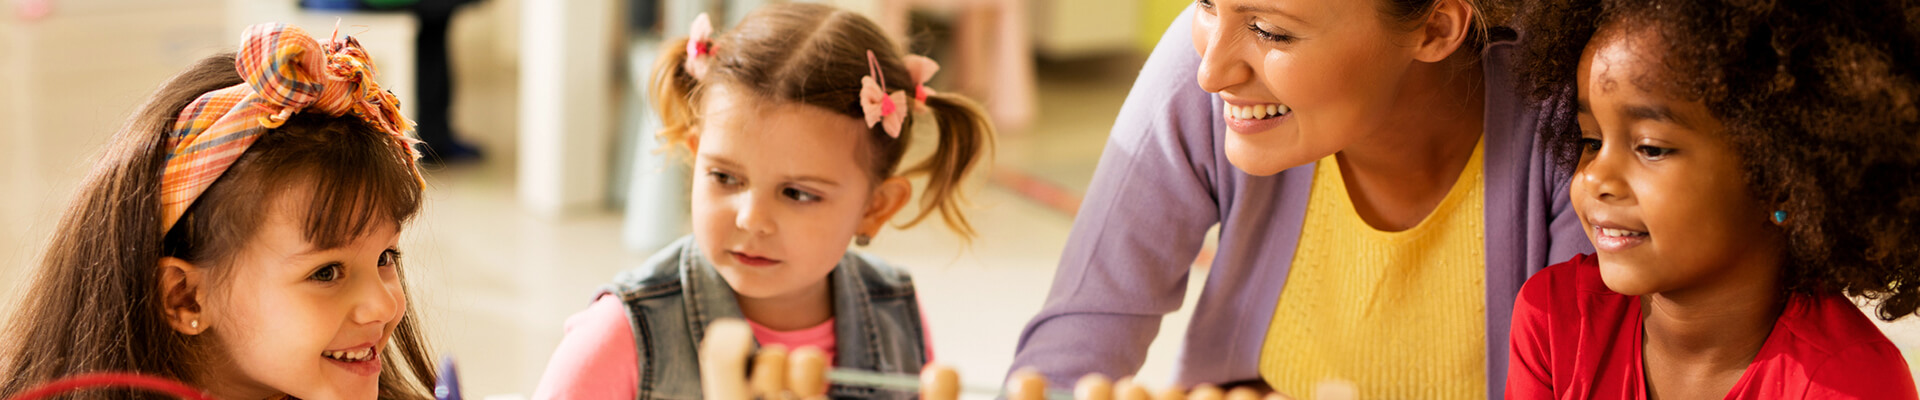 preschool promise students